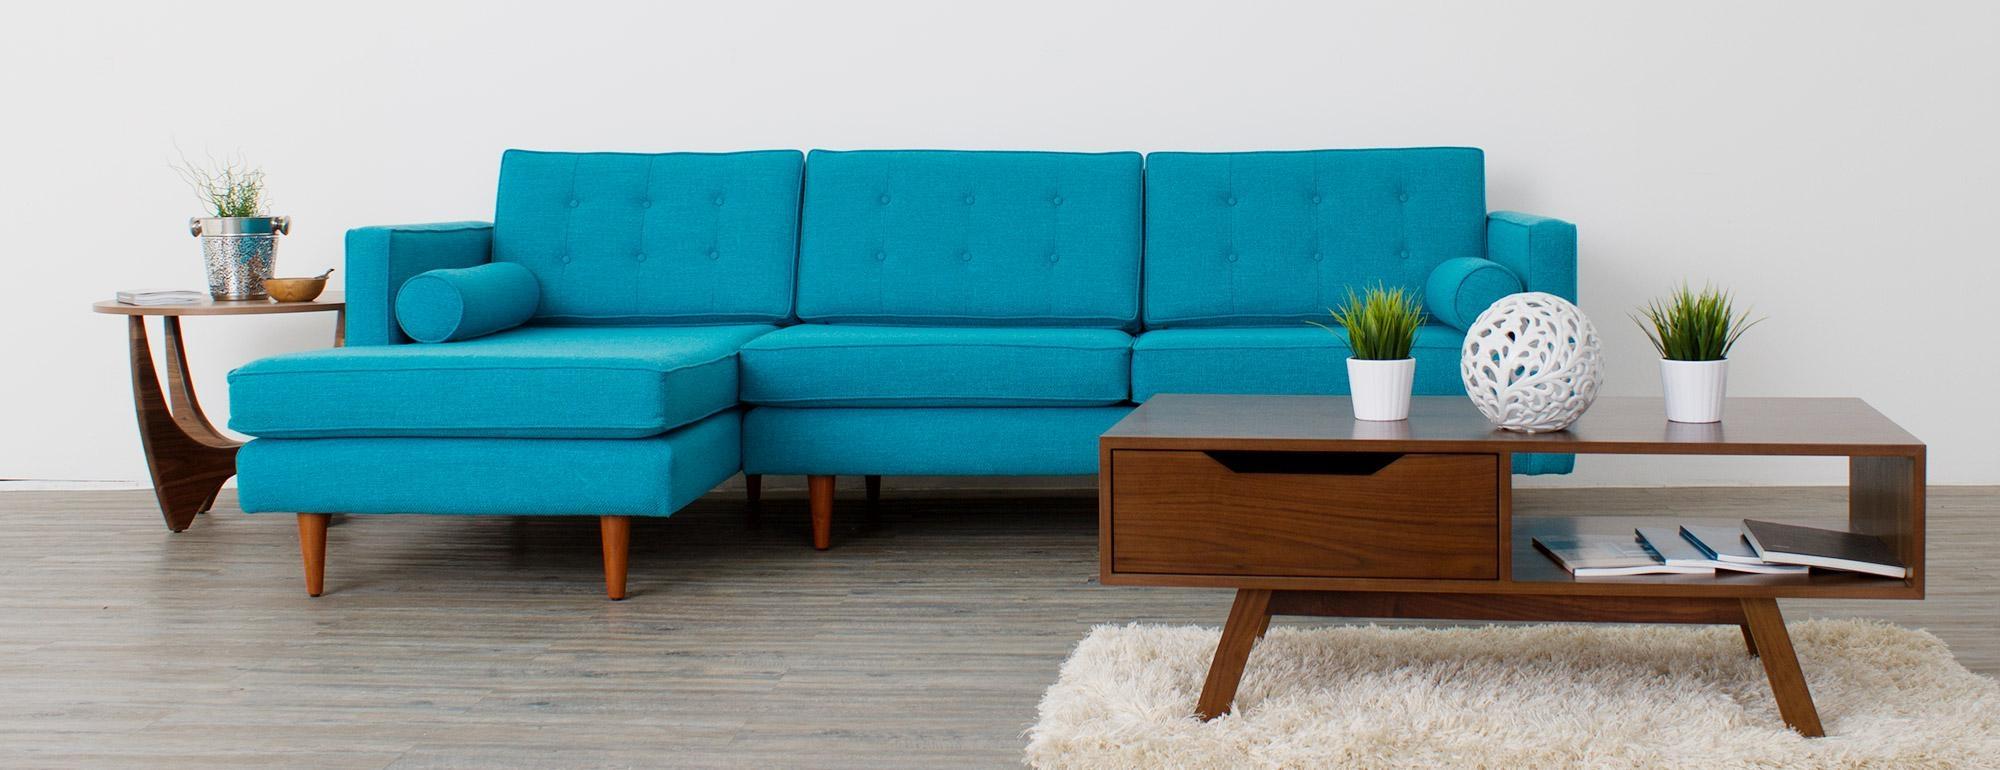 Braxton Sectional | Joybird Regarding Braxton Sectional Sofas (Image 4 of 20)